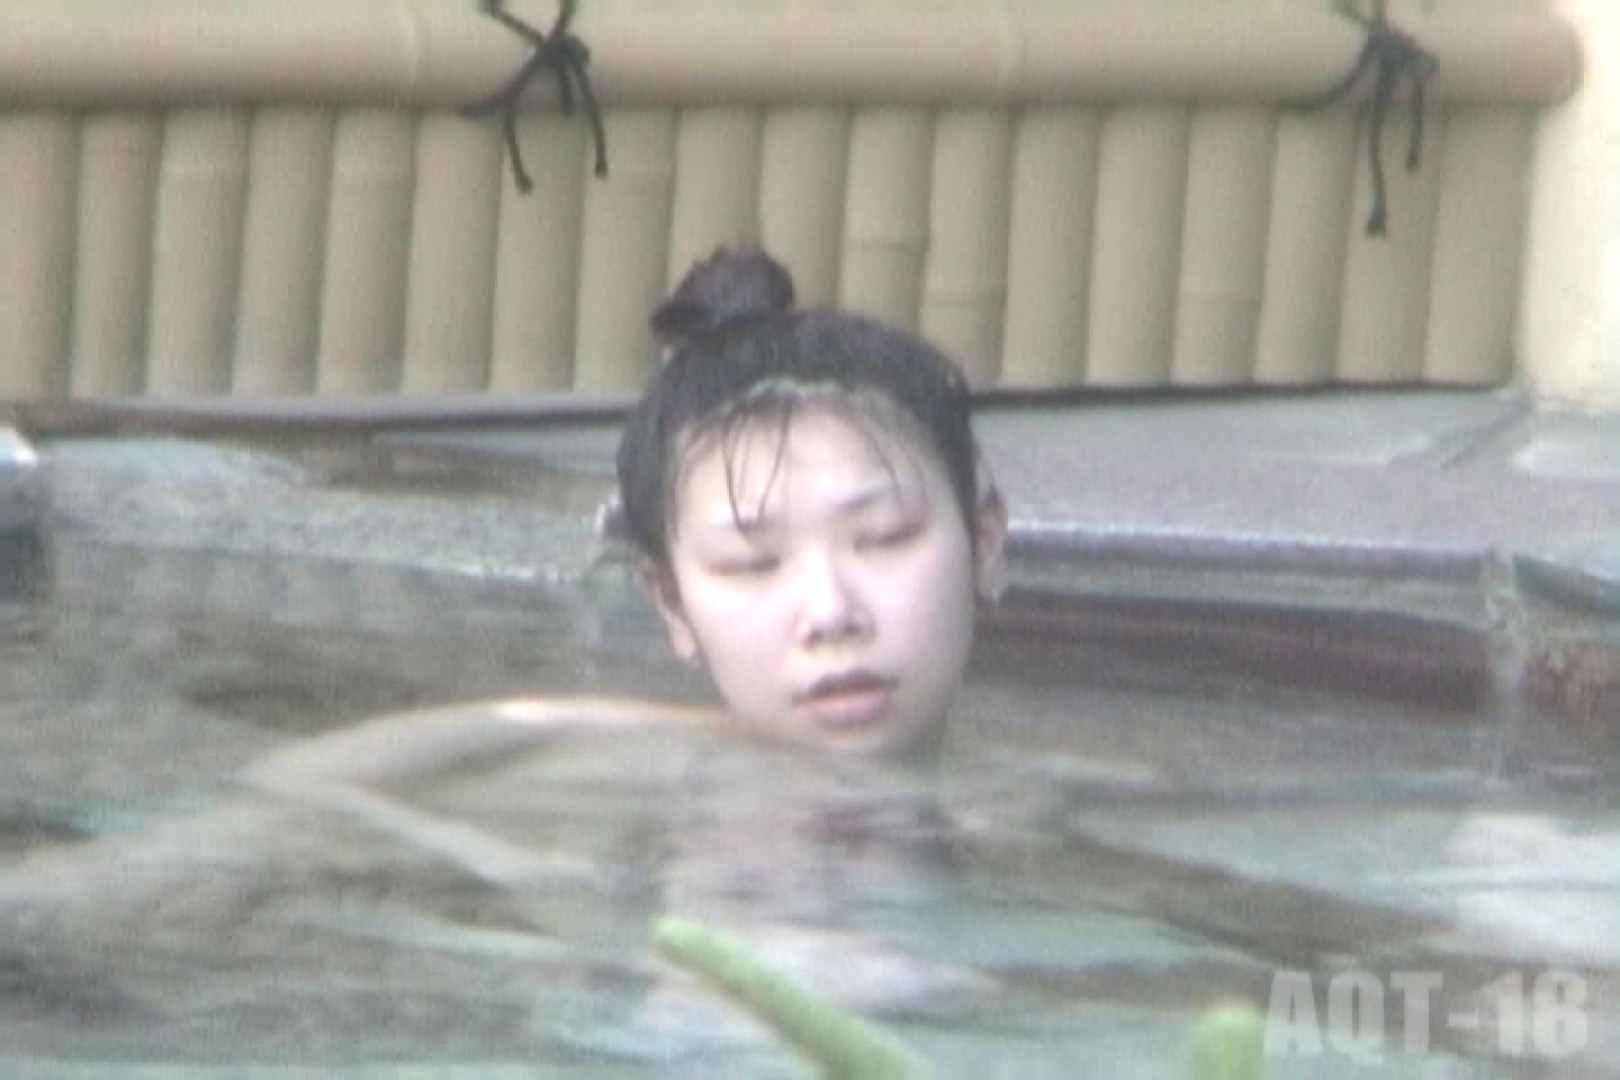 Aquaな露天風呂Vol.855 露天風呂編 | 盗撮シリーズ  86PIX 51